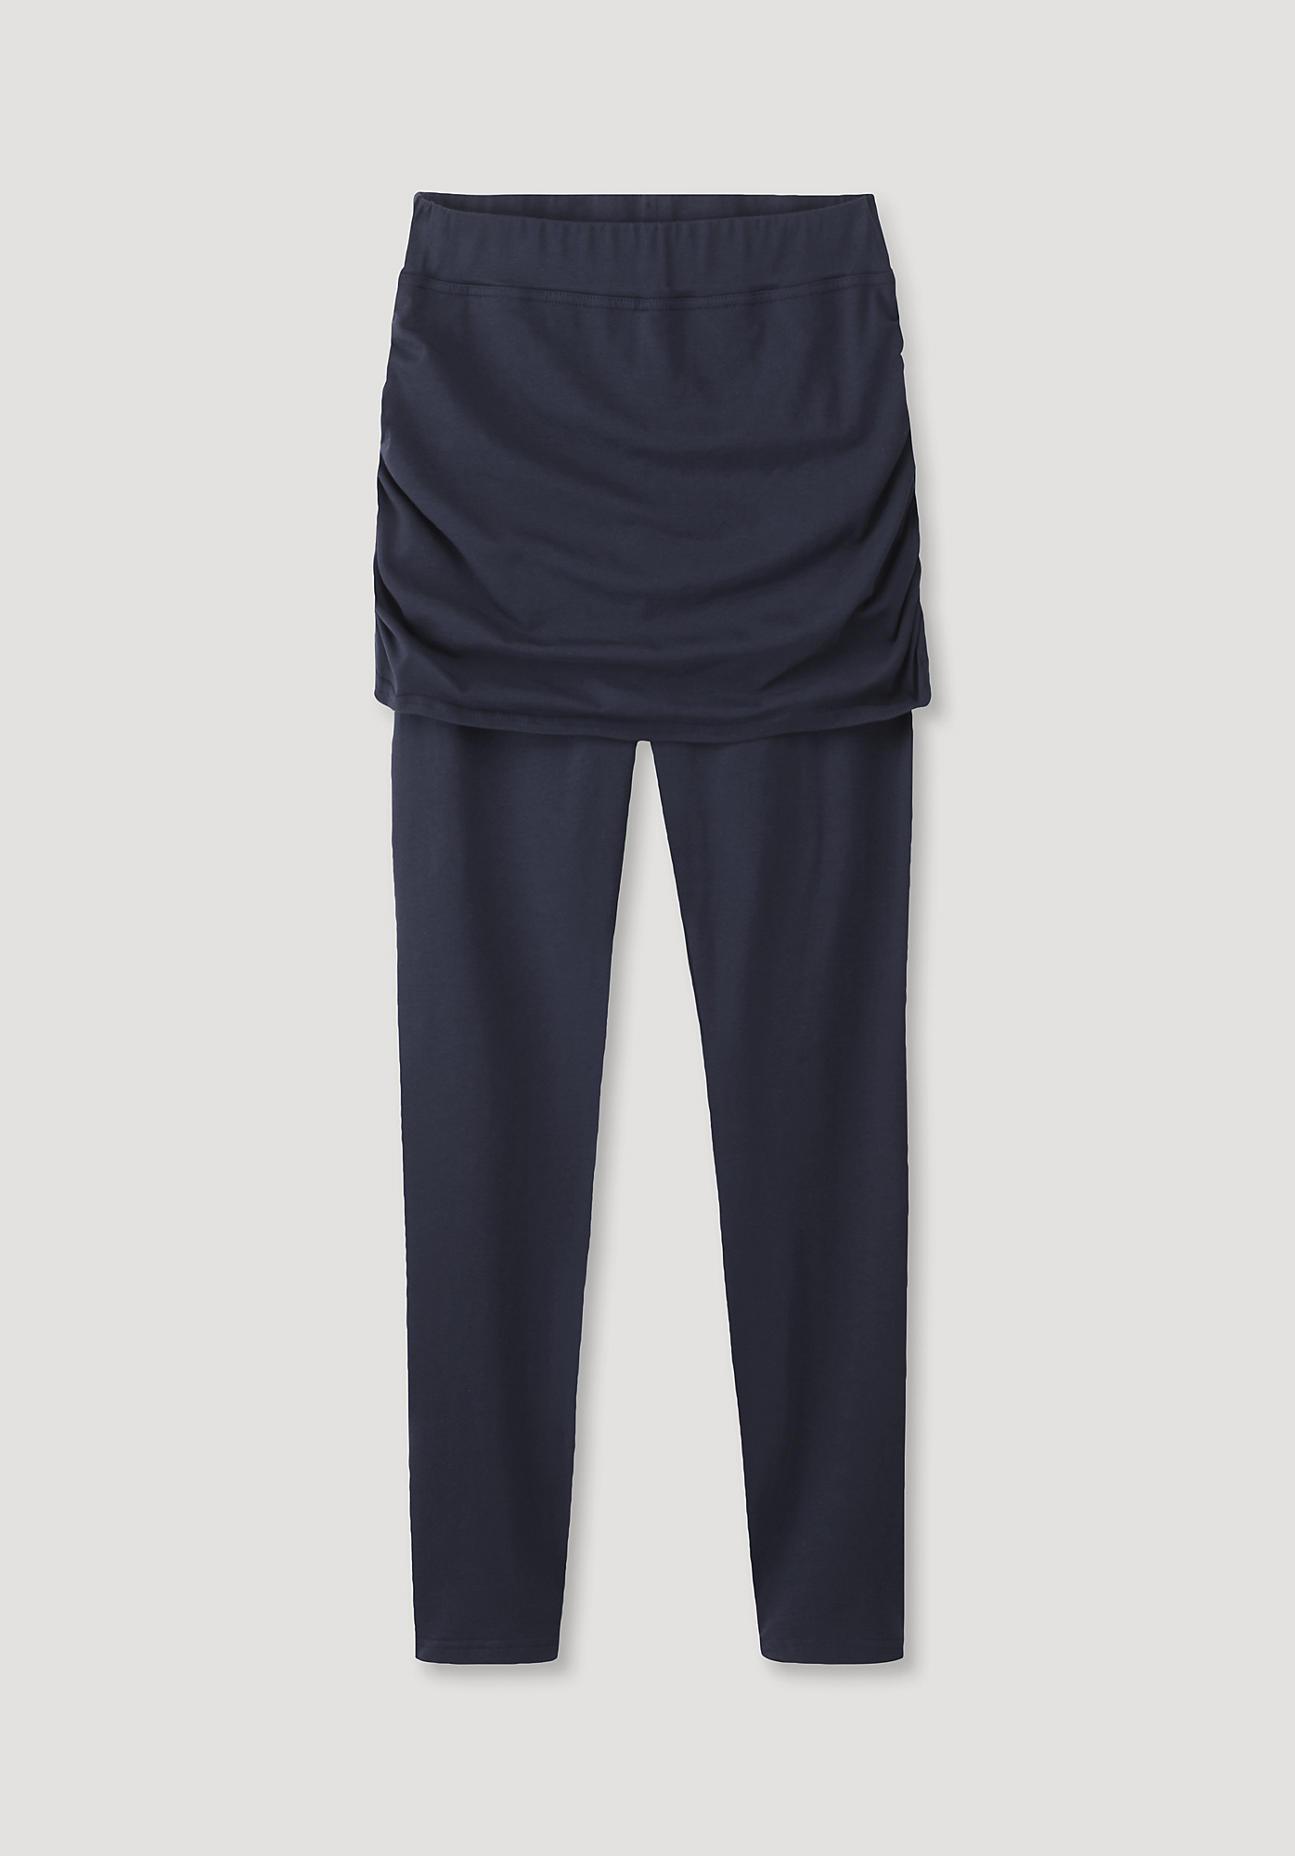 hessnatur -  Loungewear Leggings aus Bio-Baumwolle – blau – Größe 46